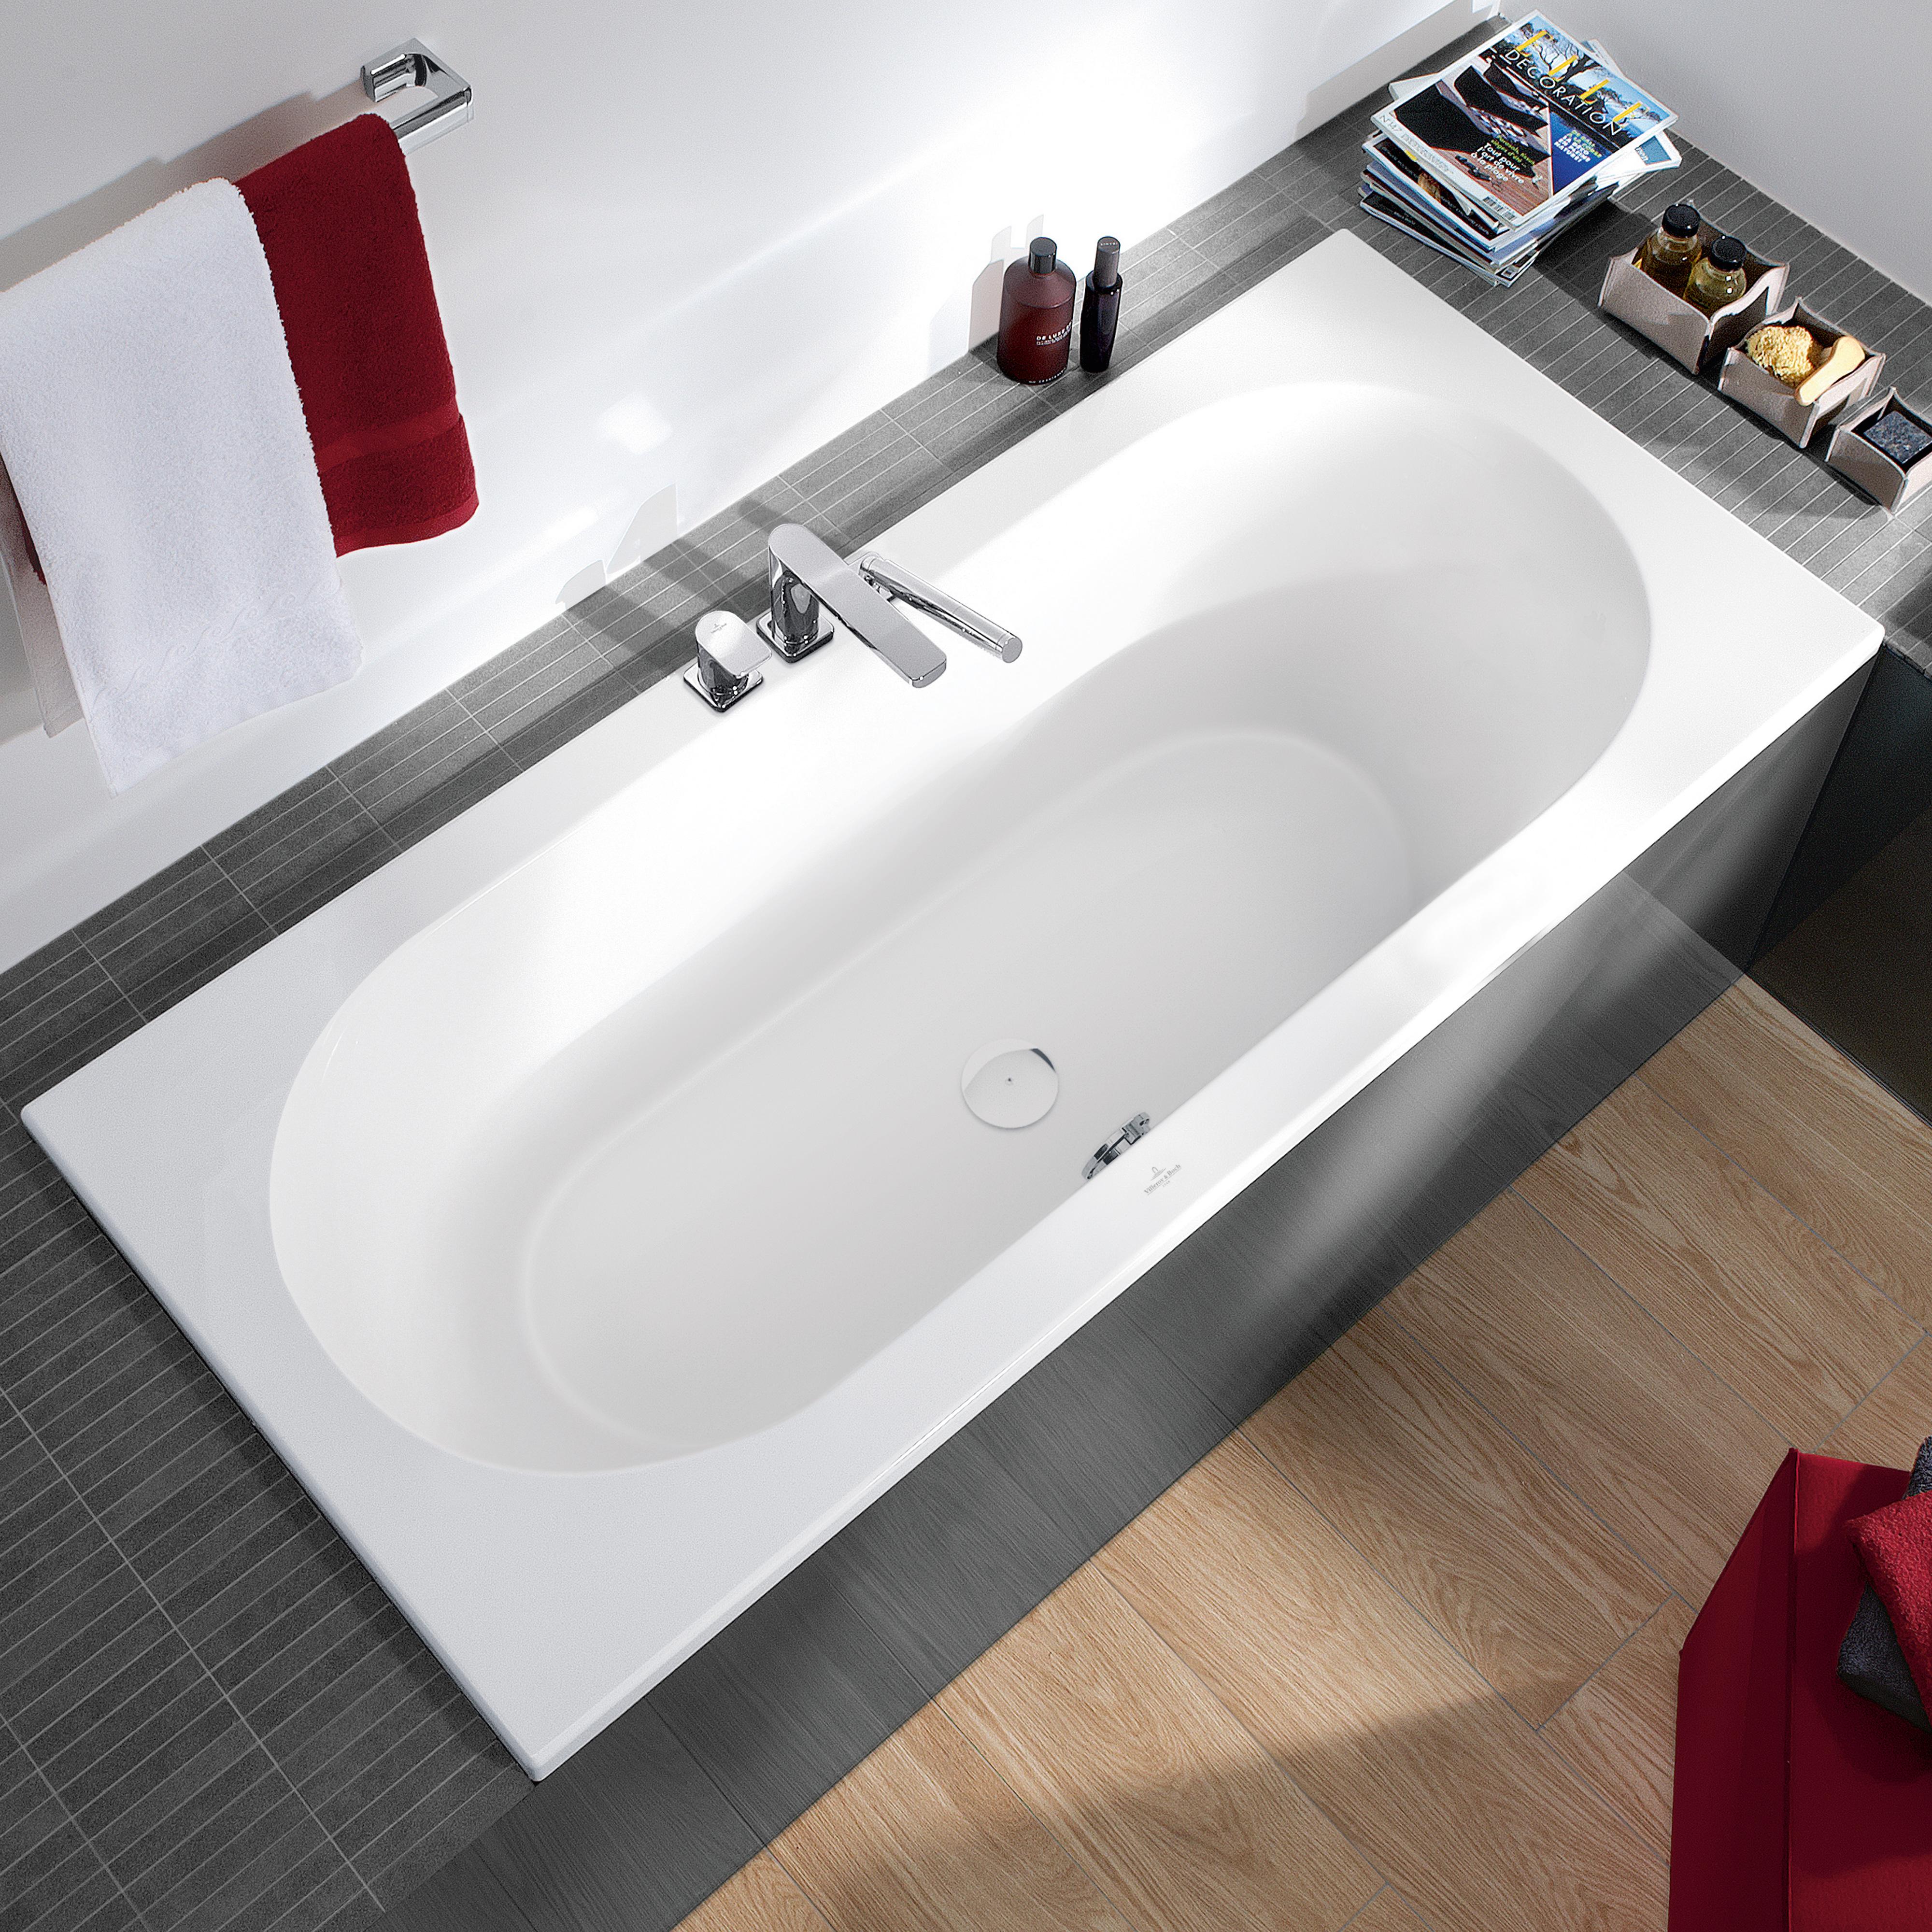 villeroy boch loop friends duo rechteck badewanne wei uba180lfo2v 01 reuter onlineshop. Black Bedroom Furniture Sets. Home Design Ideas